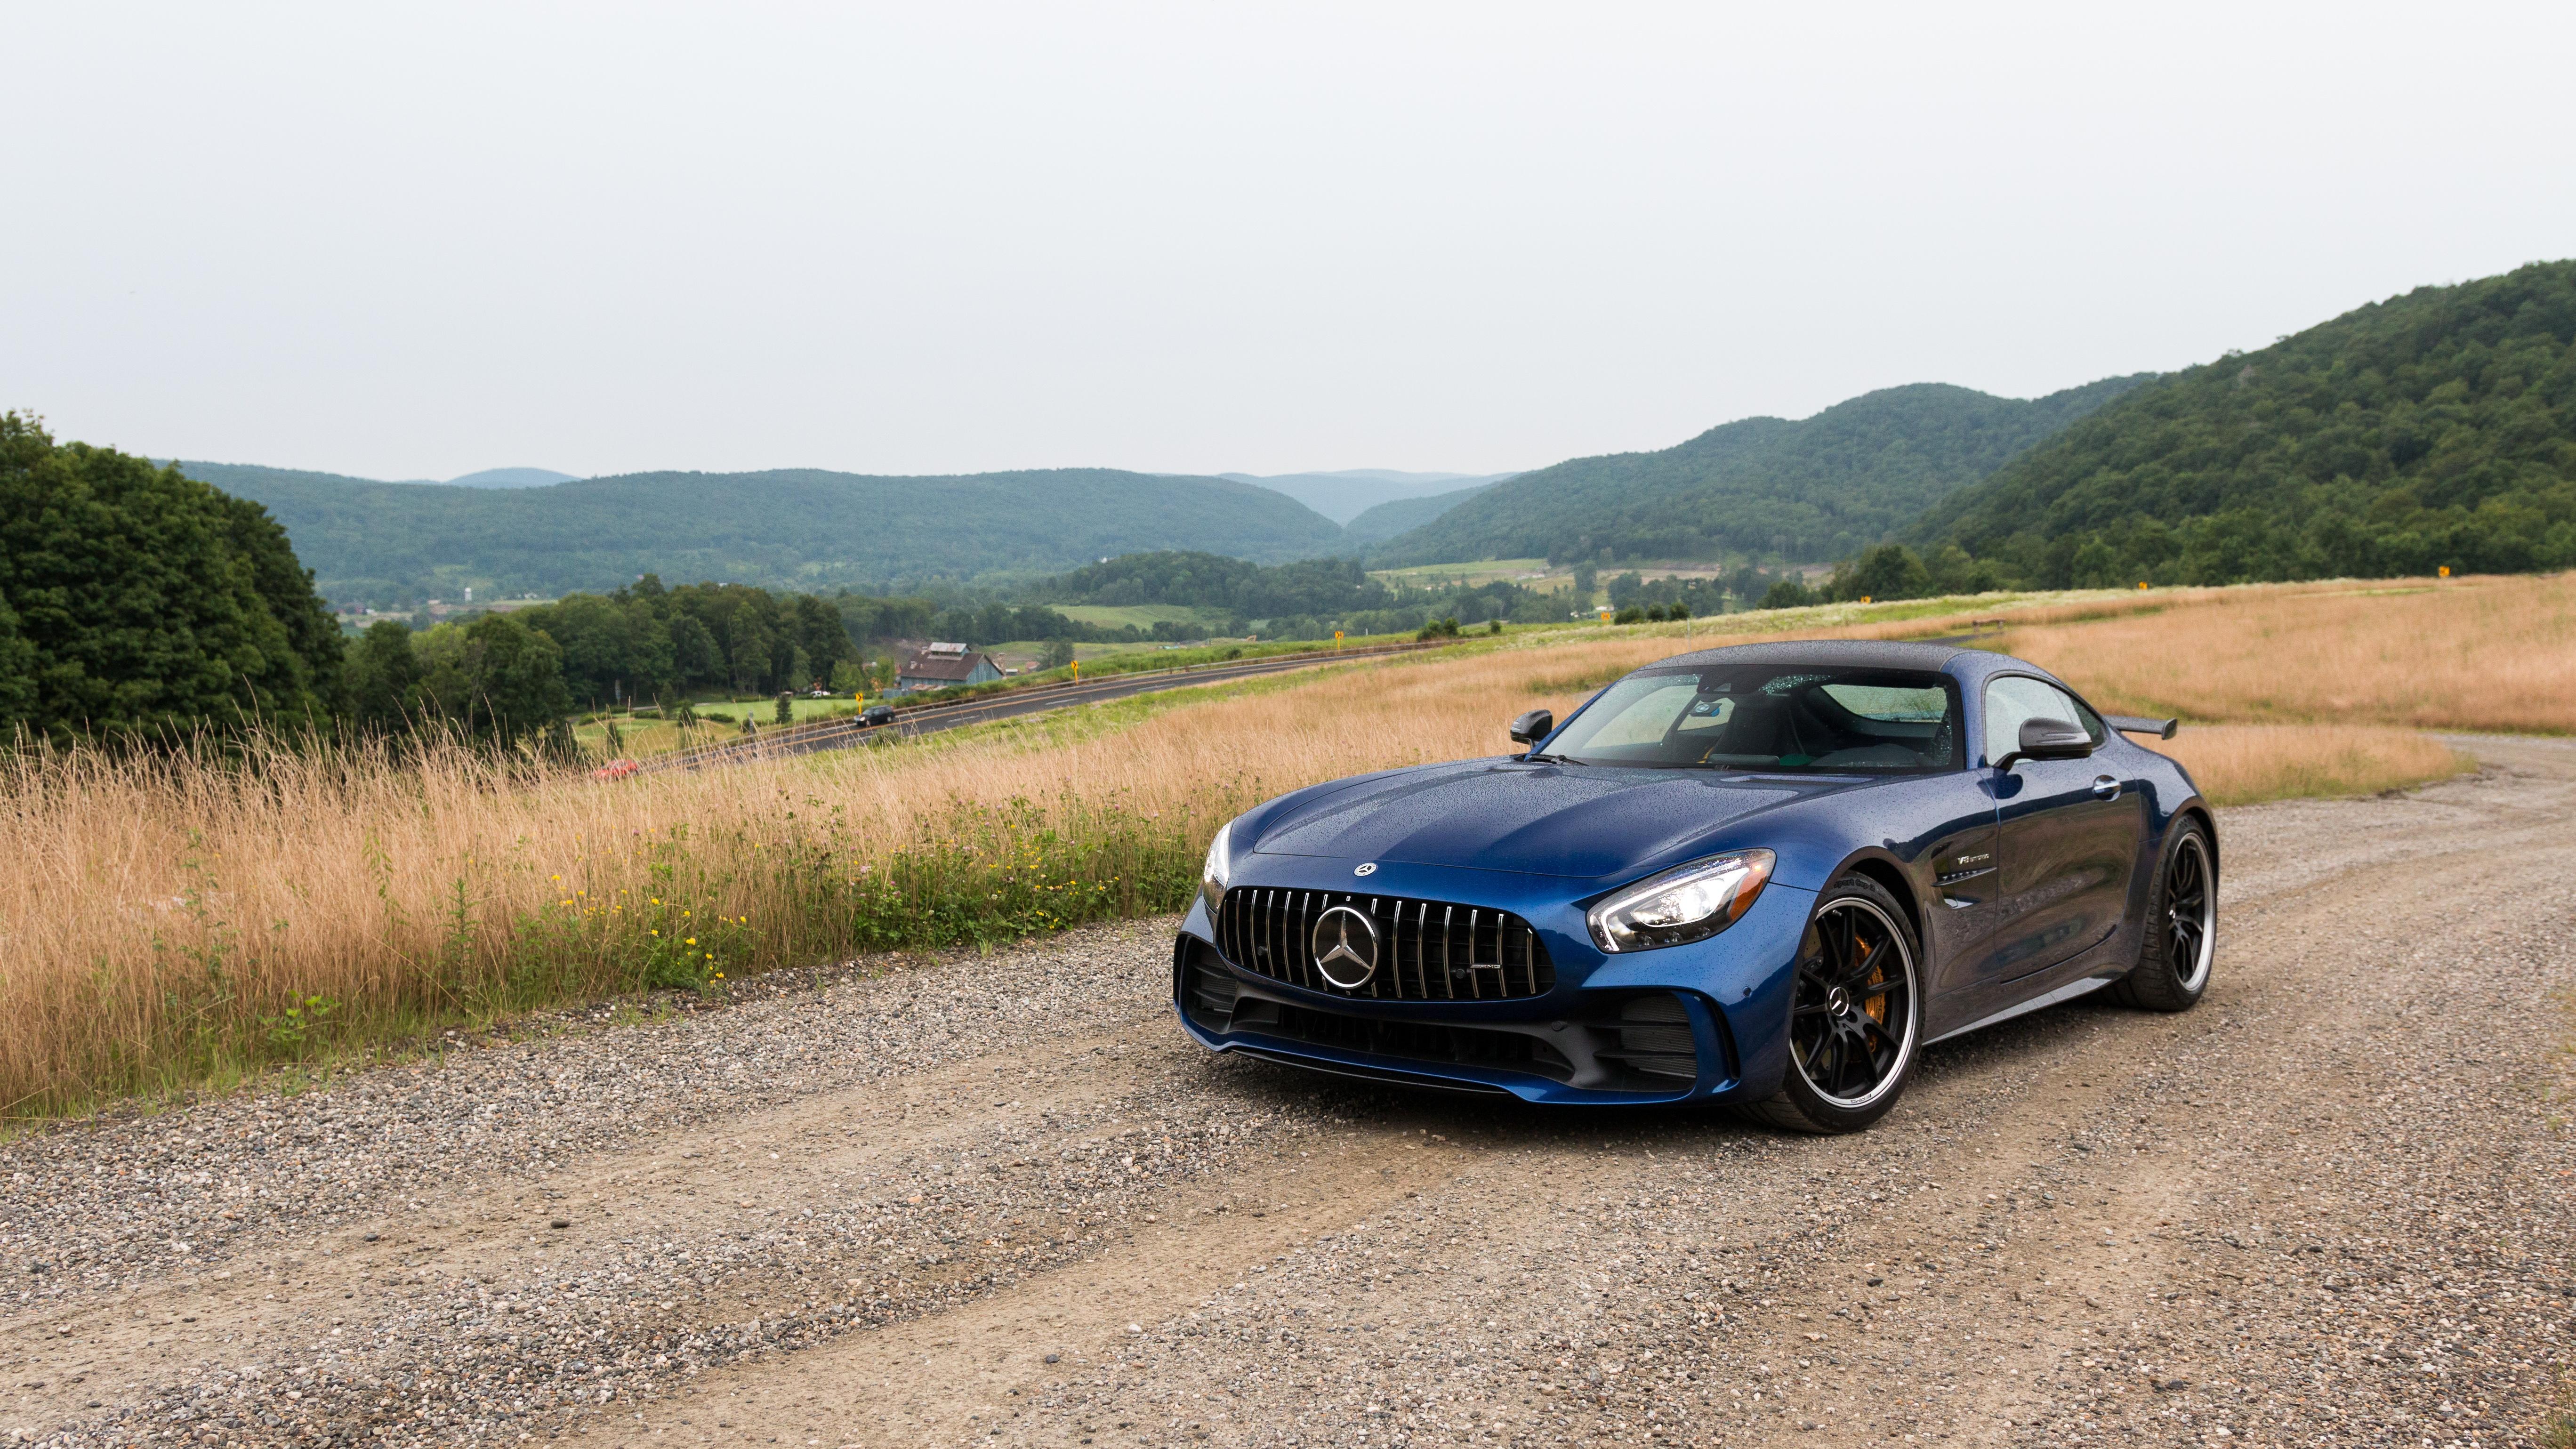 Your 2018 Mercedes-AMG GT R Desktop Wallpaper Is Here